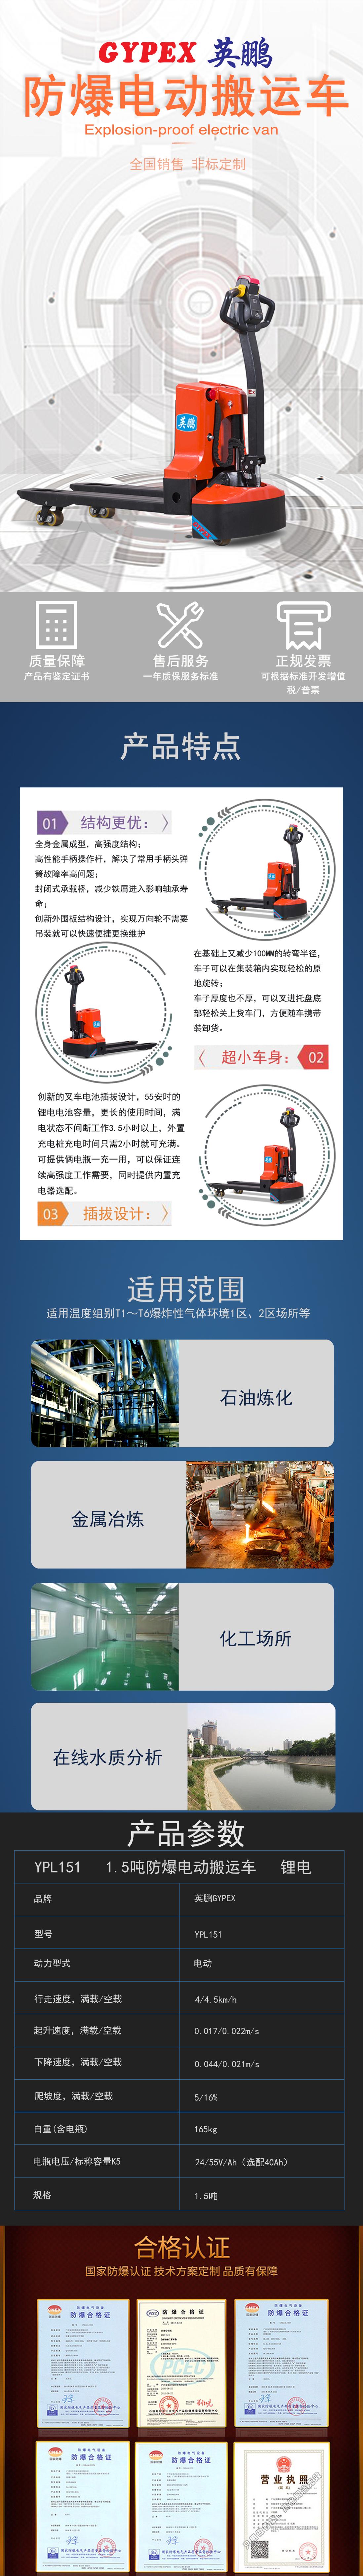 YPL151電動搬運車 鋰電詳情圖.jpg